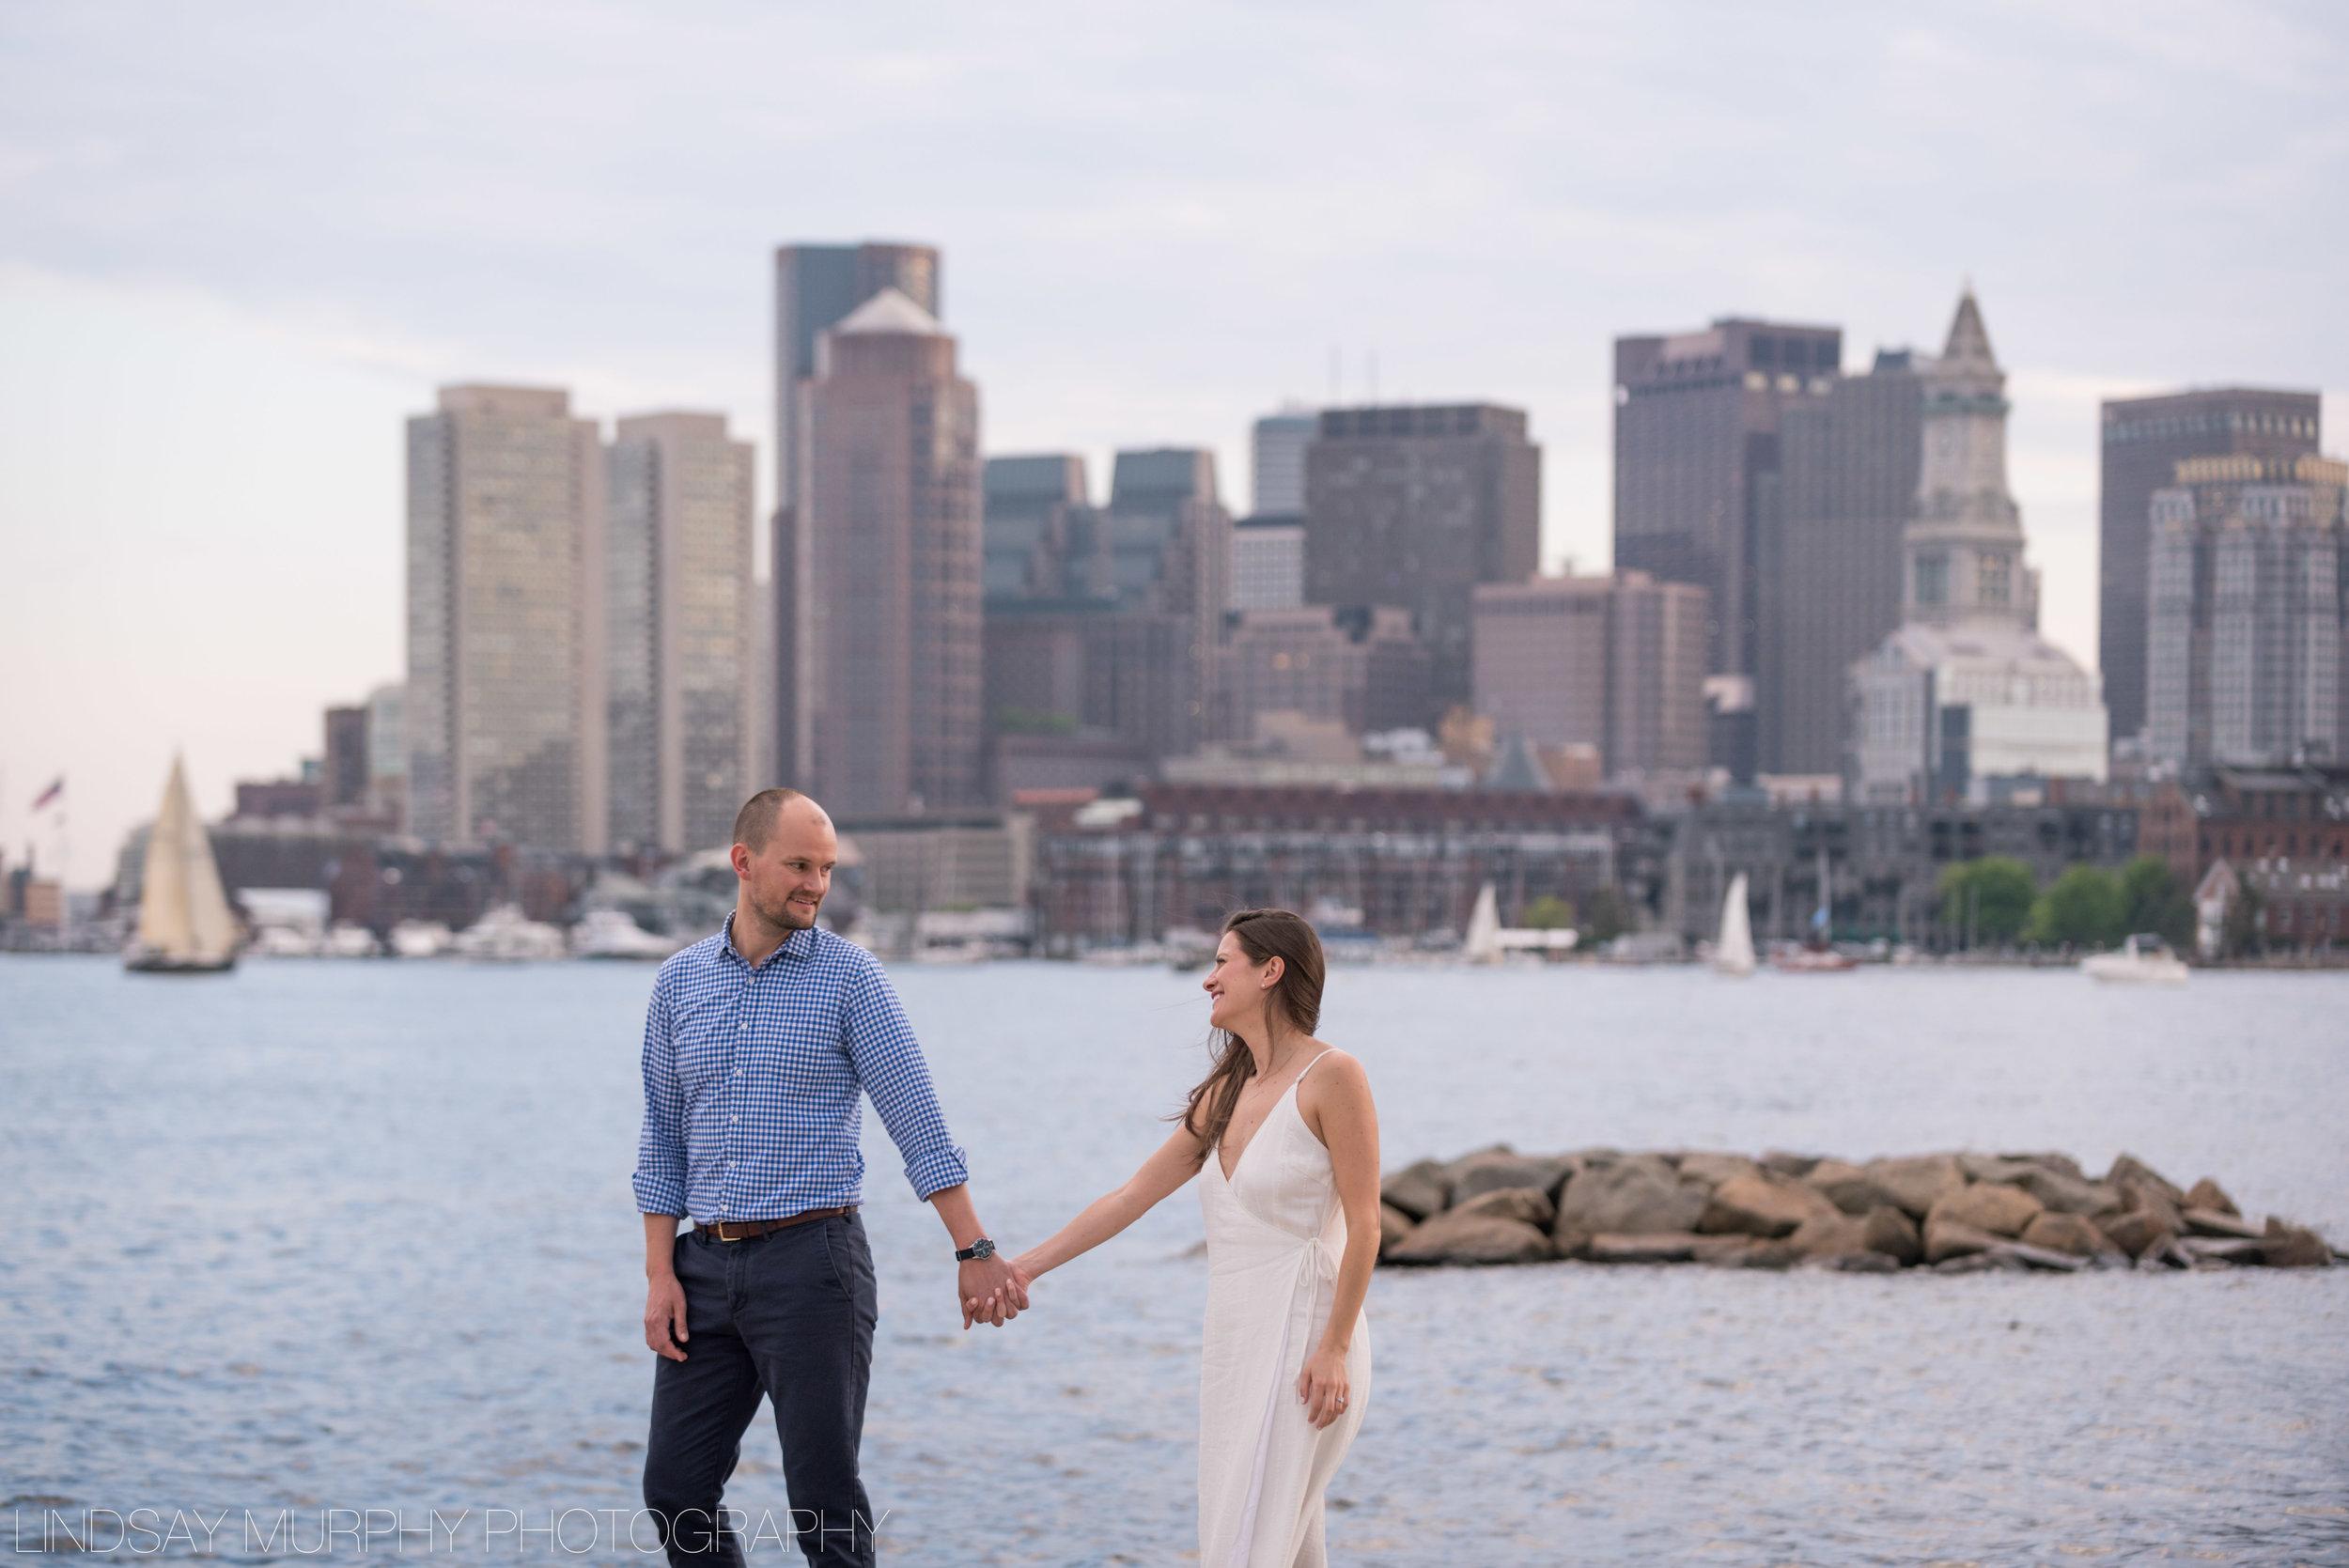 Boston_Engagement_Photography-72.jpg